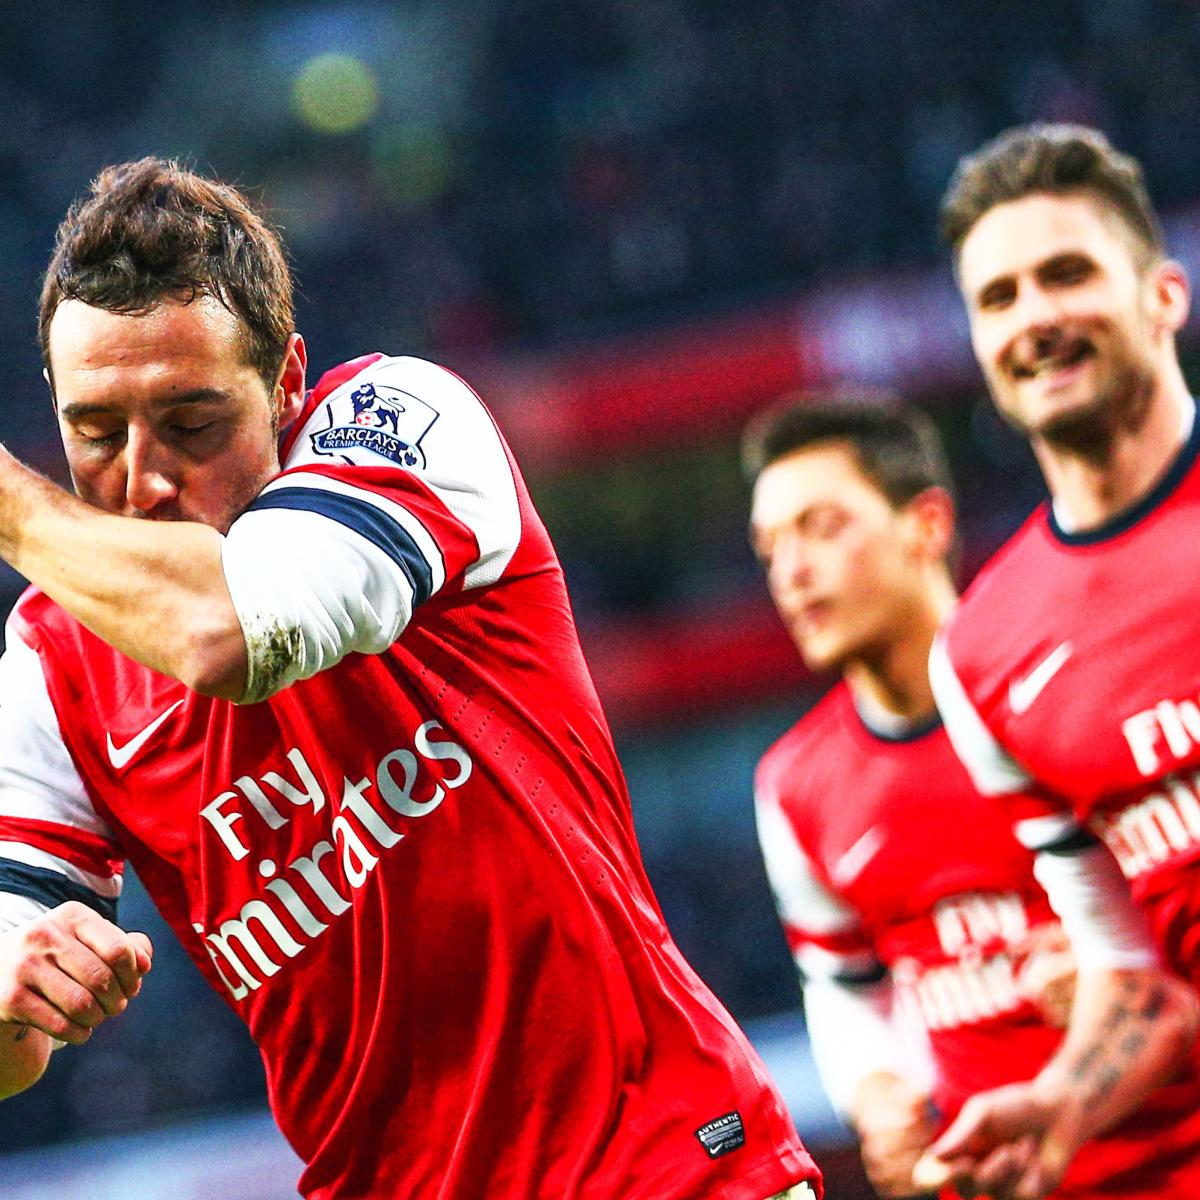 Arsenal Vs Tottenham Live Score Highlights From Premier: Stoke City Vs. Arsenal: Premier League Live Score